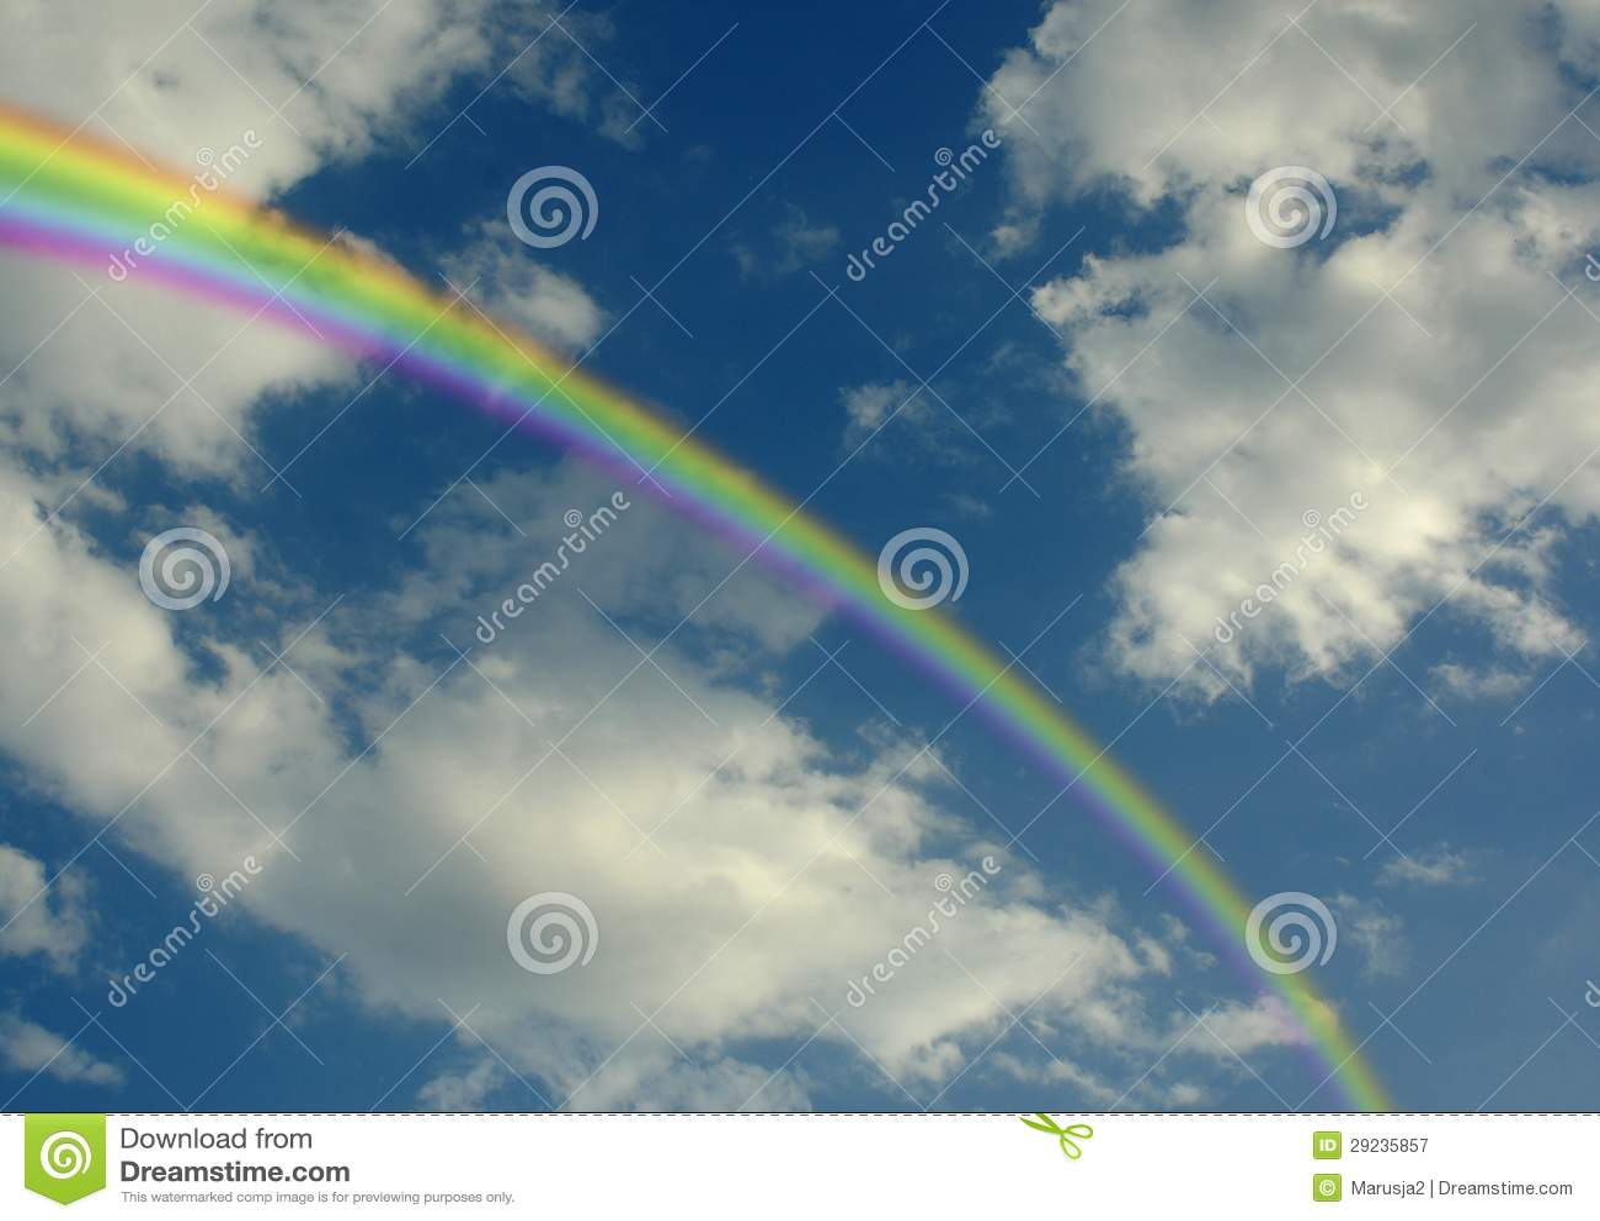 Download Arco-íris imagem de stock. Imagem de nave, outdoor, cloudy - 29235857